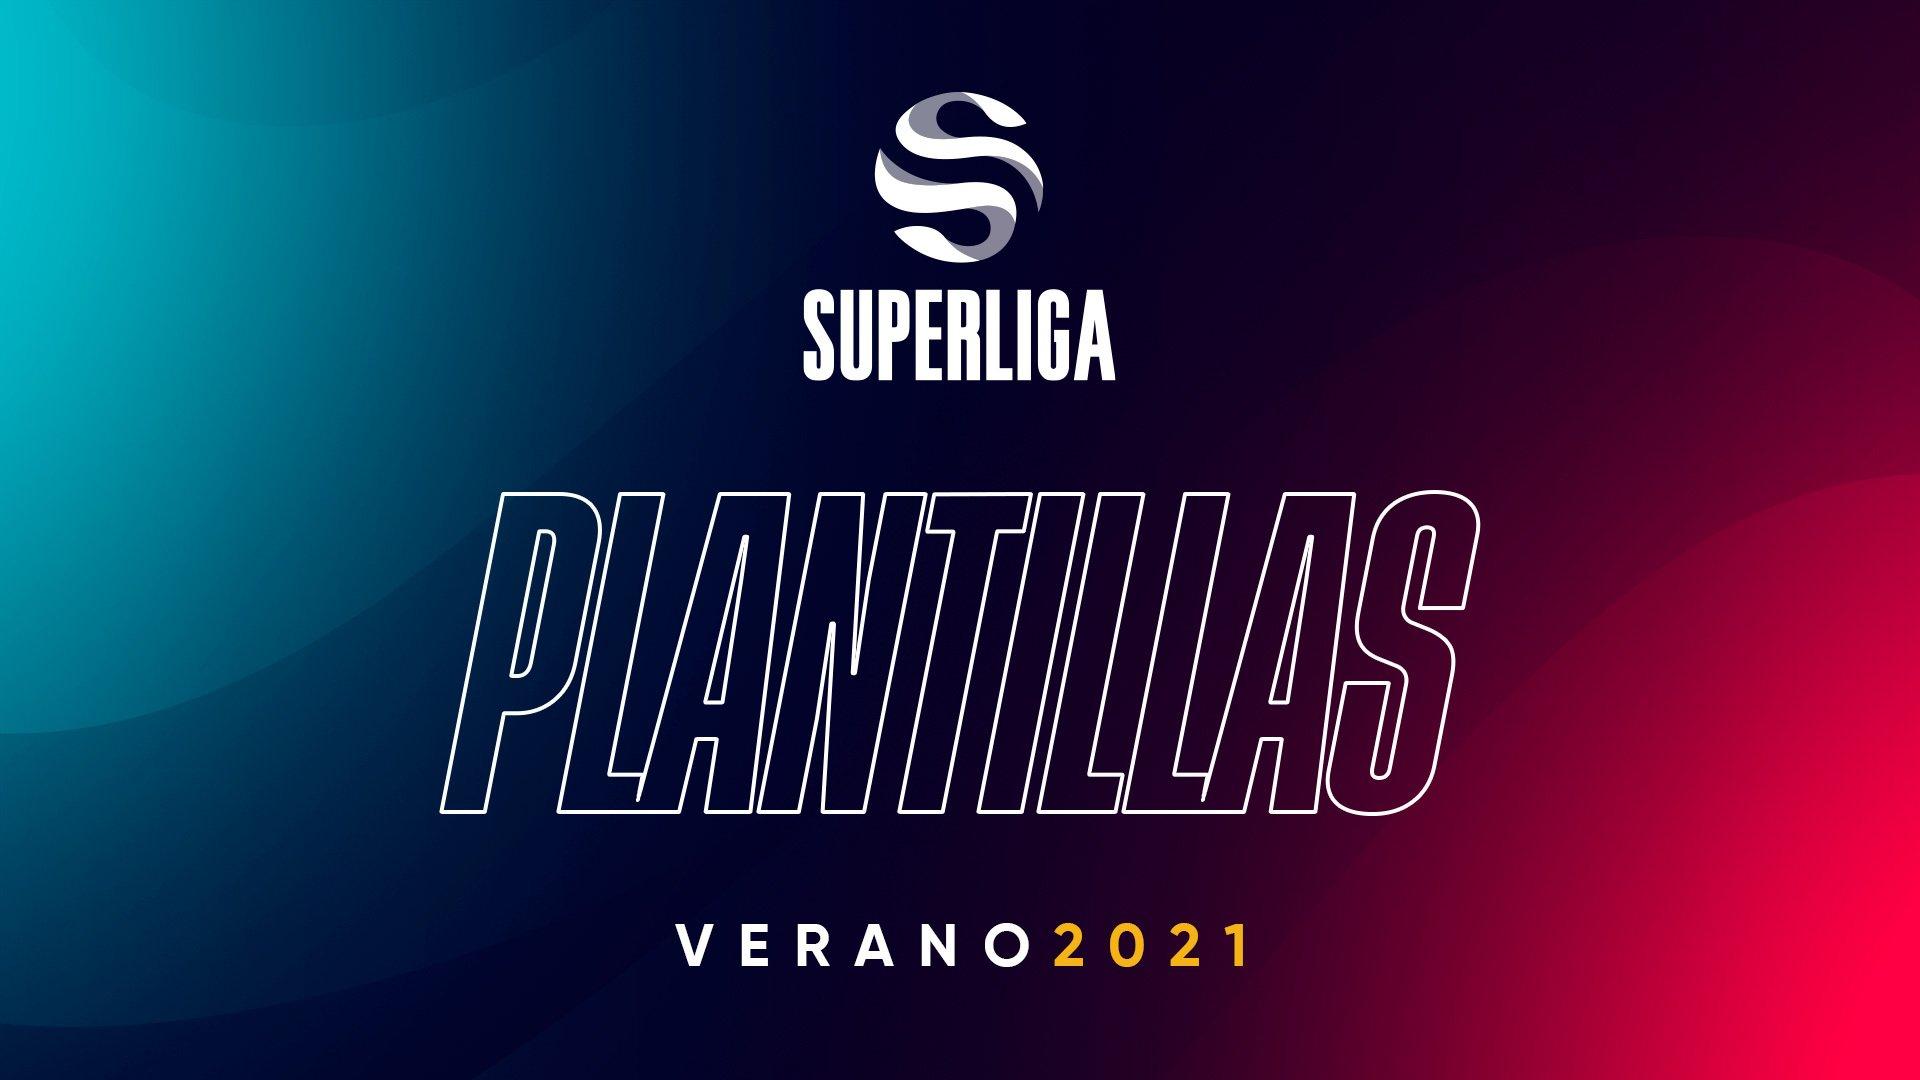 Plantillas Superliga slipt verano 2021